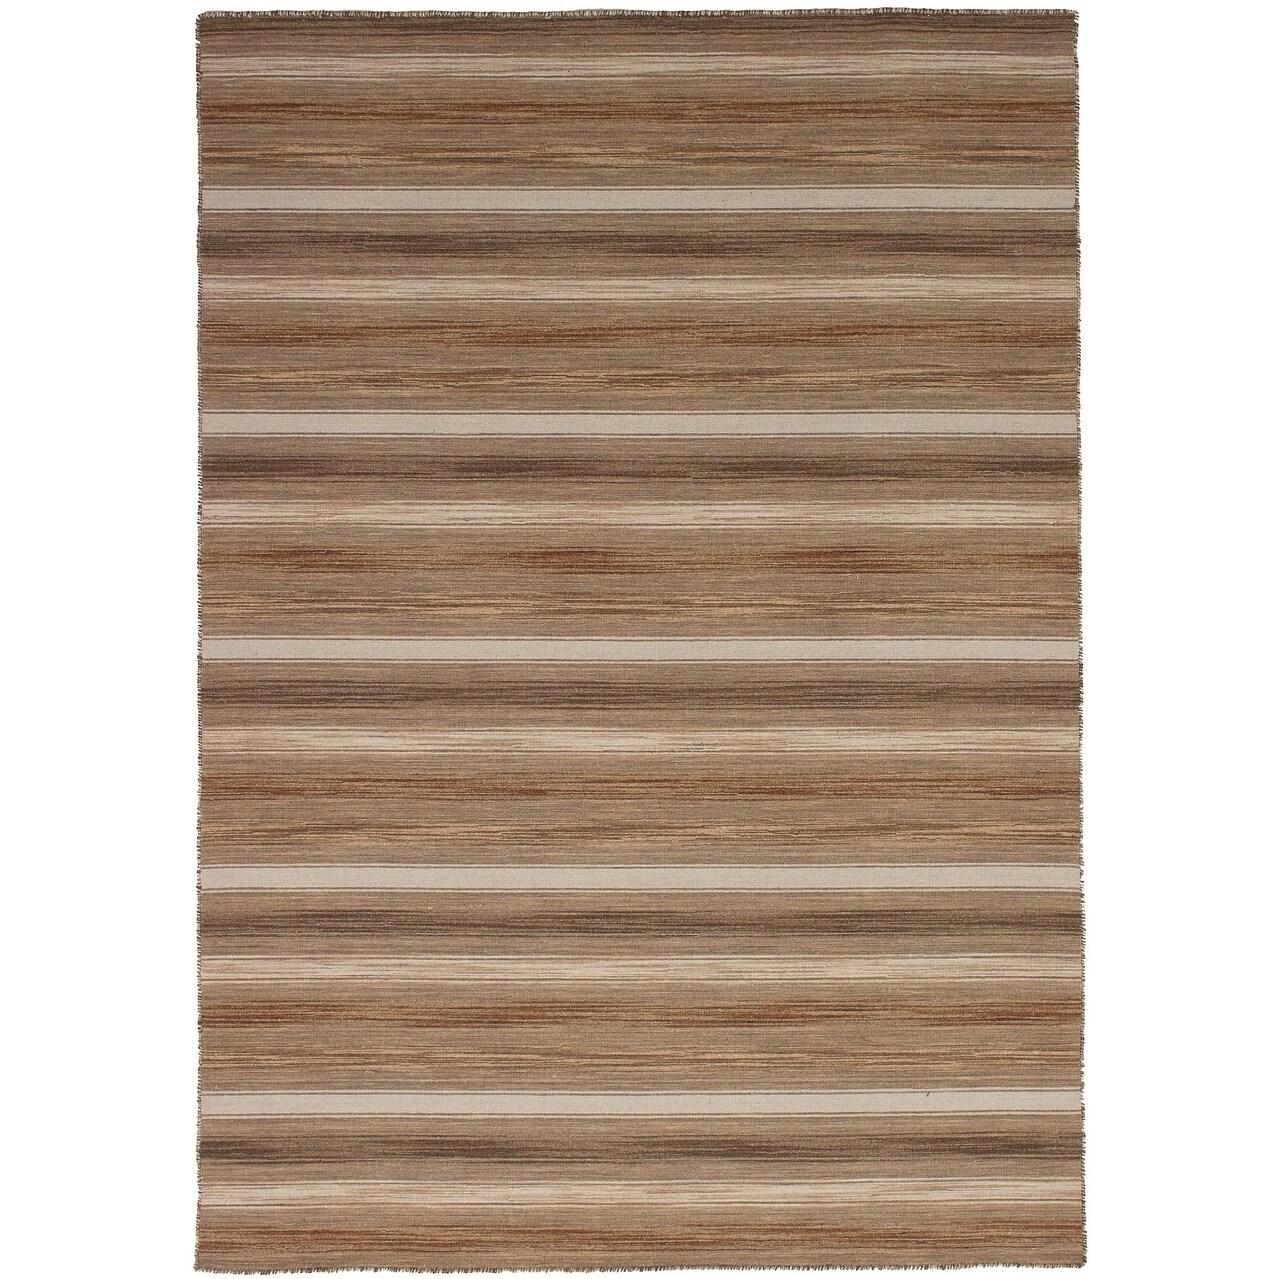 ECARPETGALLERY Flat-weave Manhattan Tan Wool Kilim - 53 x 76 (TAN - 53 x 76)